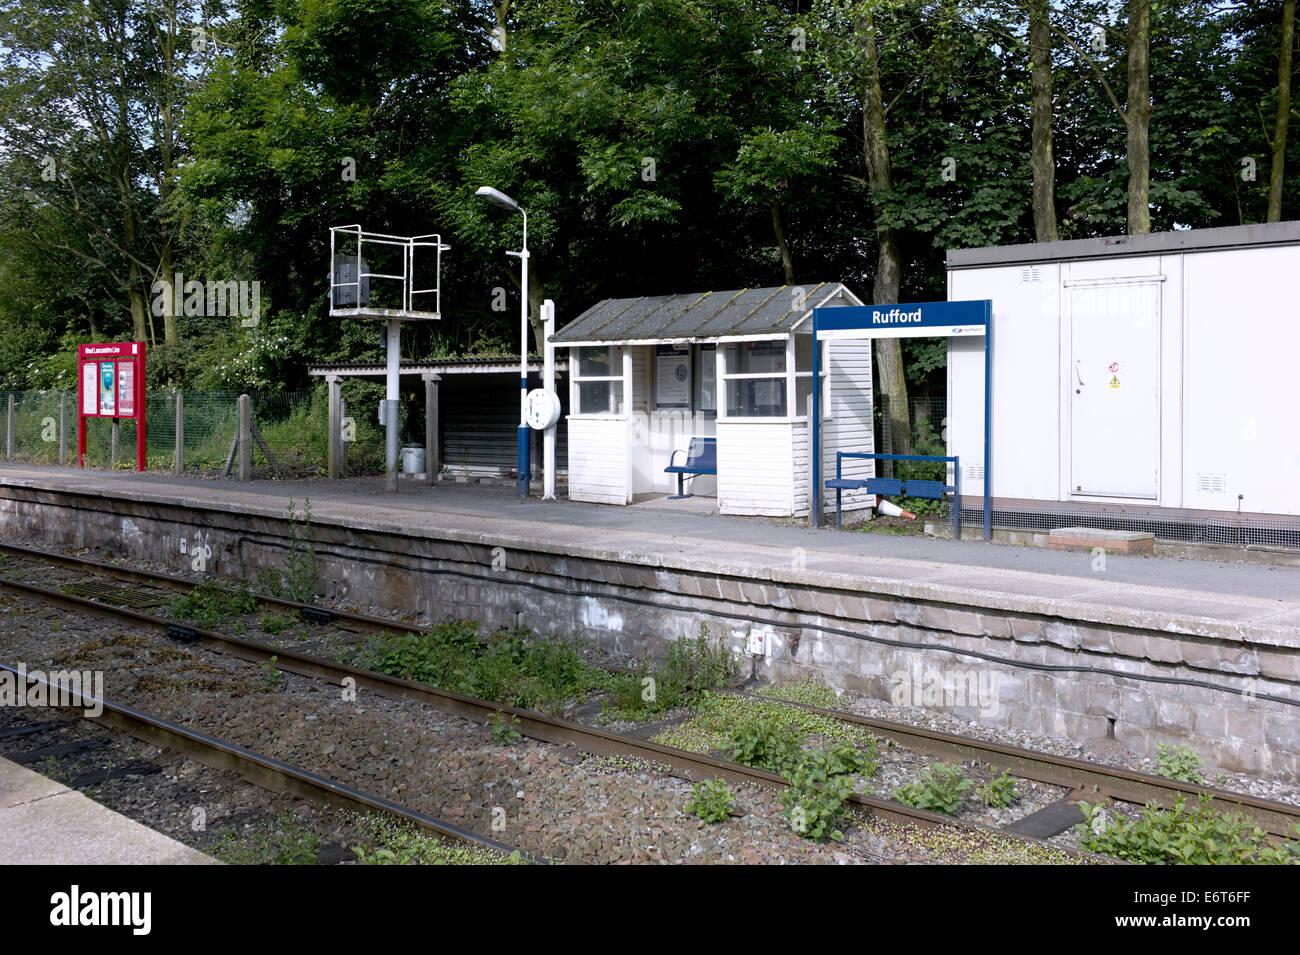 Rufford station platform - Stock Image